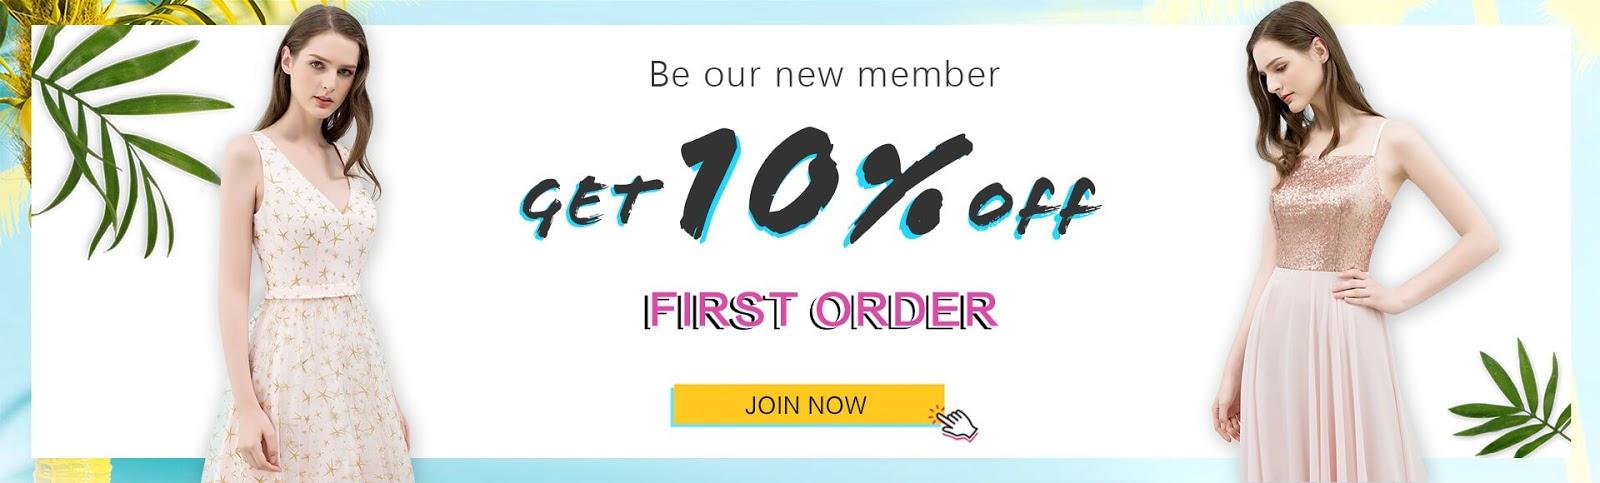 https://www.babyonlinewholesale.com/de?utm_source=blog&utm_medium=Monika&utm_campaign=post&source=Monika